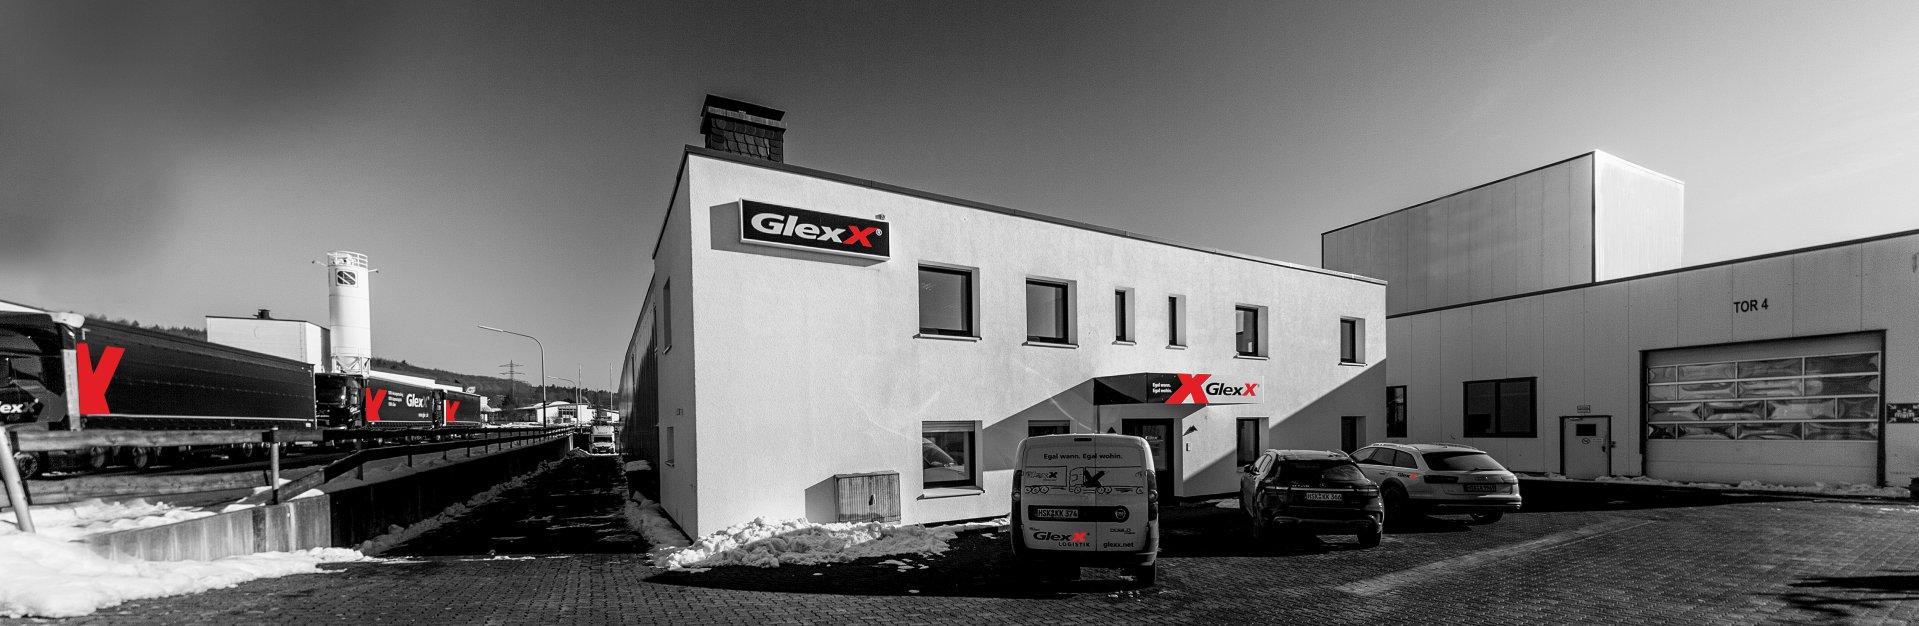 glexx_logistik_unternehmen